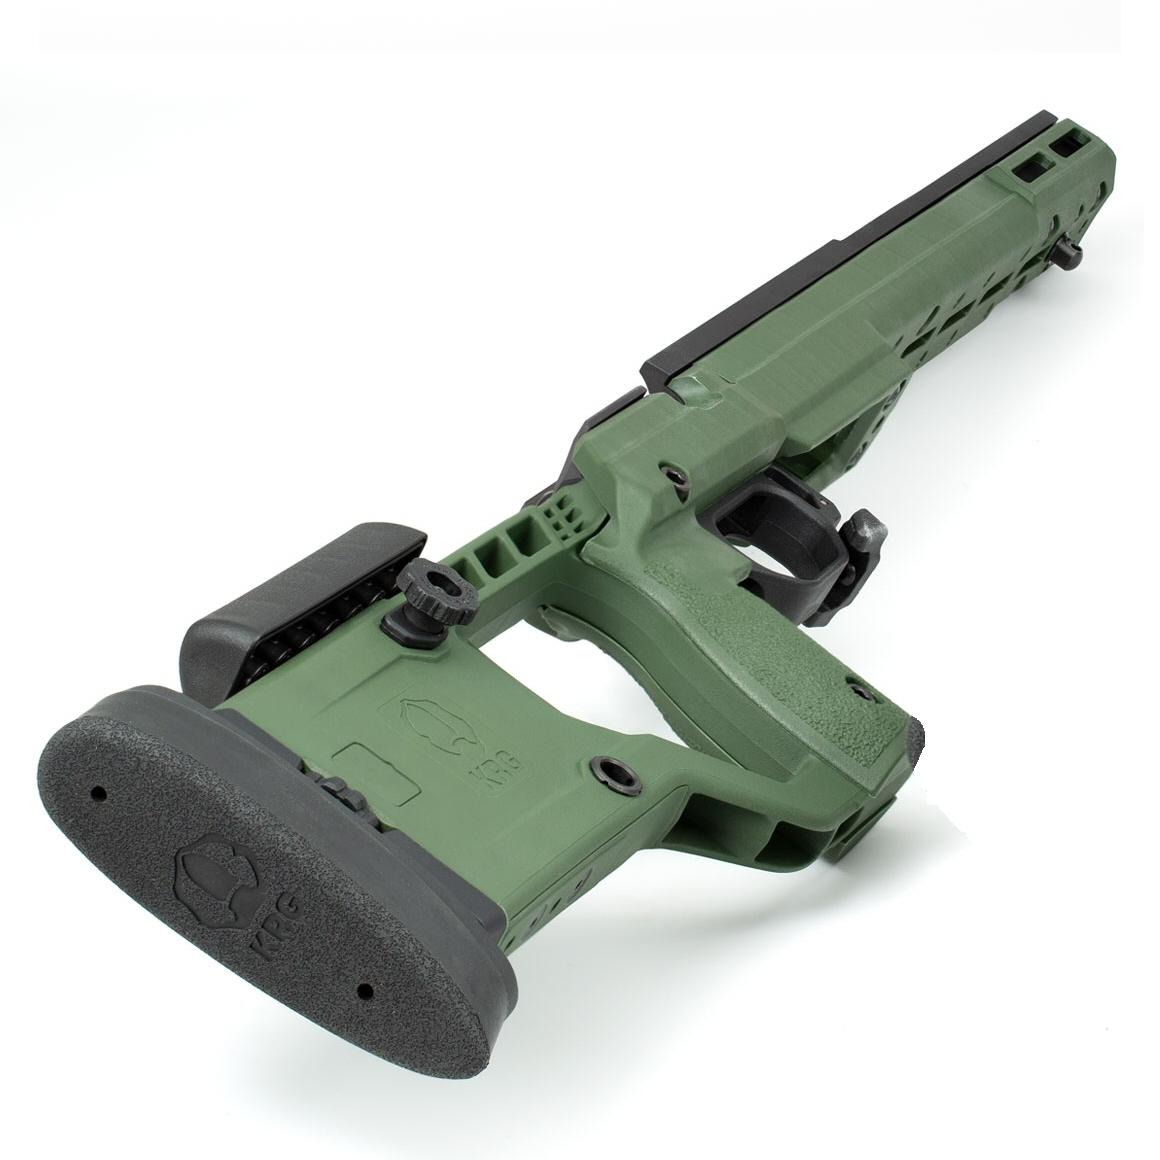 KRG X-Ray Rifle Chassis Tikka T3 Green